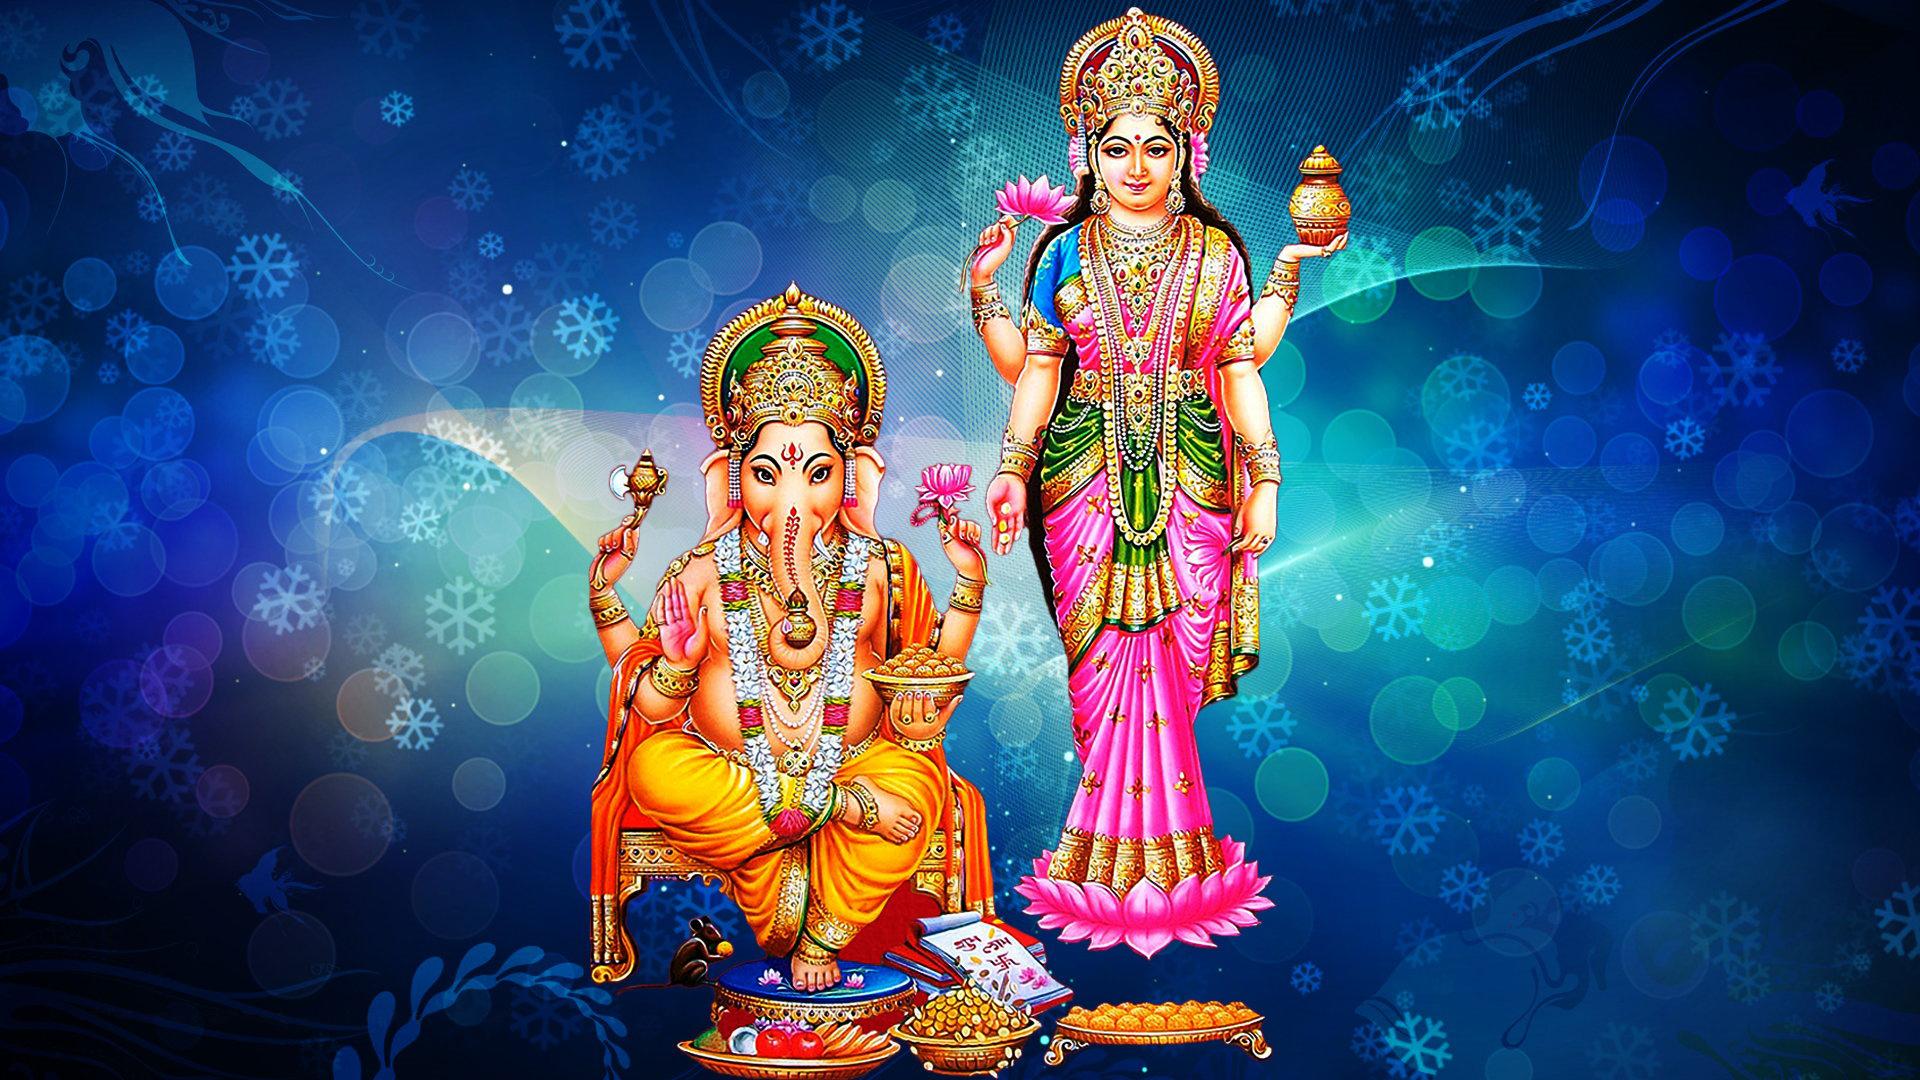 Rama 3d Wallpaper Goddess Laxmi And Lord Ganesh Blue Decorative Background